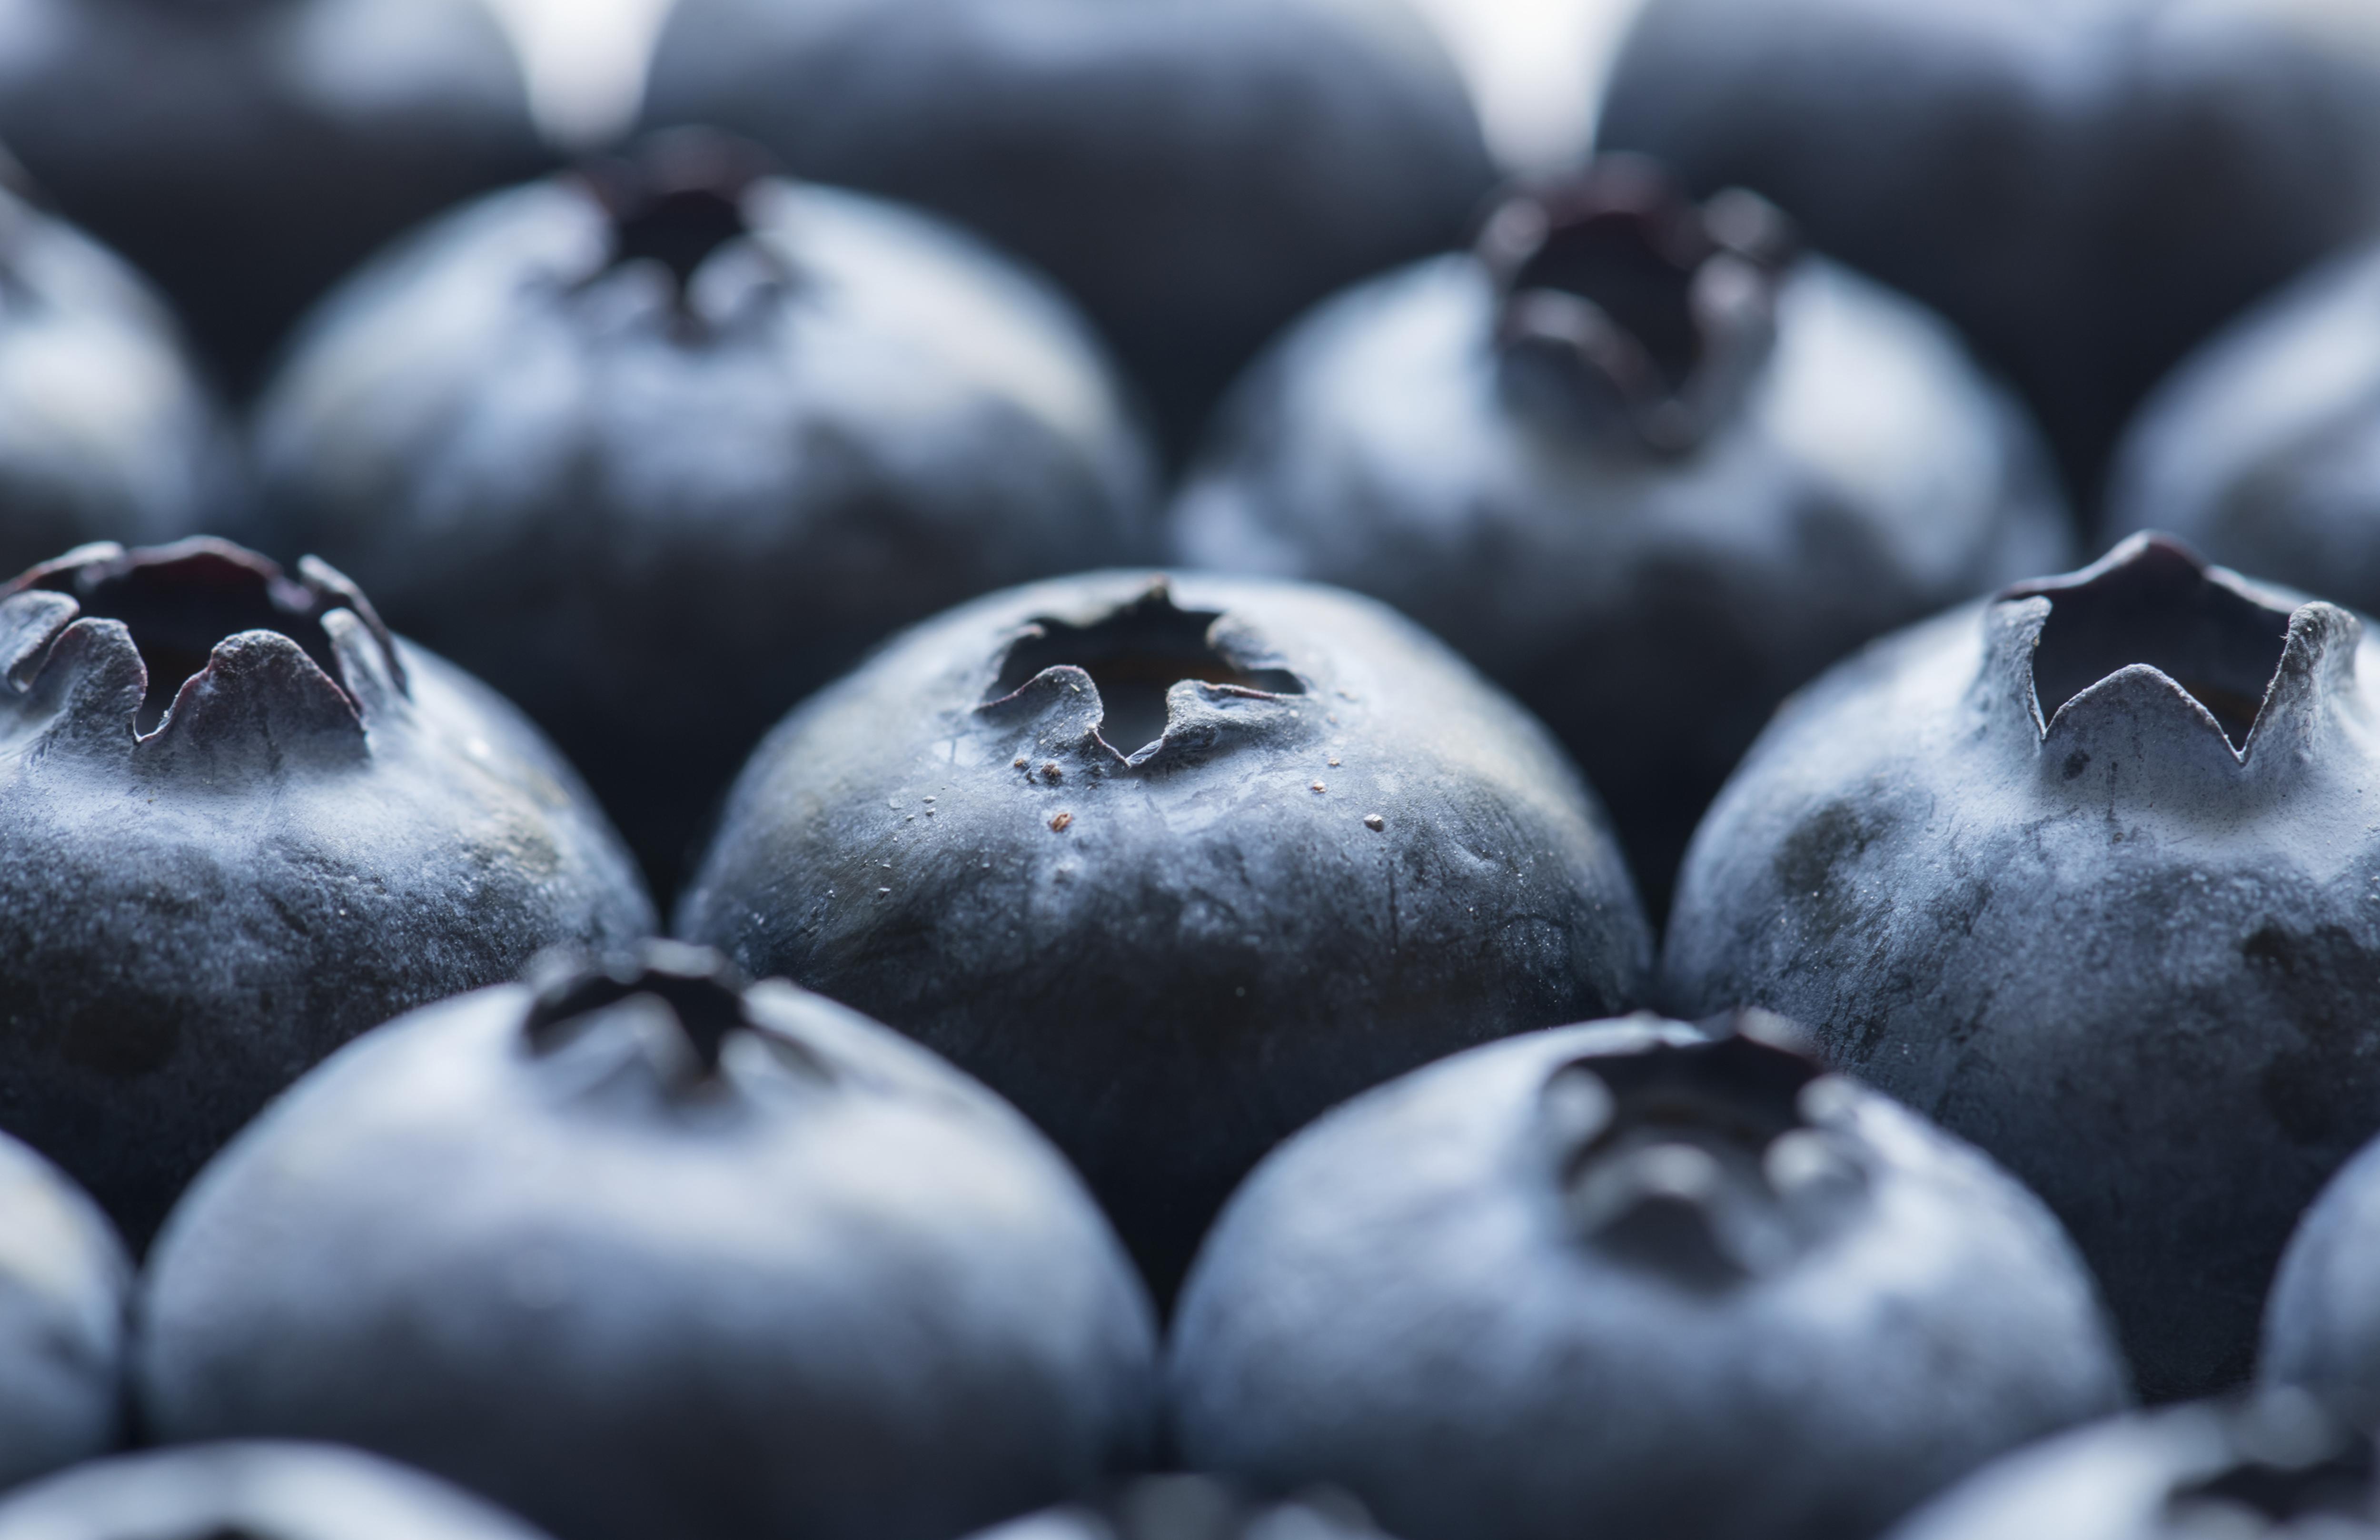 free images antioxidant, background, berry, blue, blueberryfree images antioxidant, background, berry, blue, blueberry, closeup, delicious, dessert, detox, diet, energy, food, fresh, freshness, fruit, healthy,